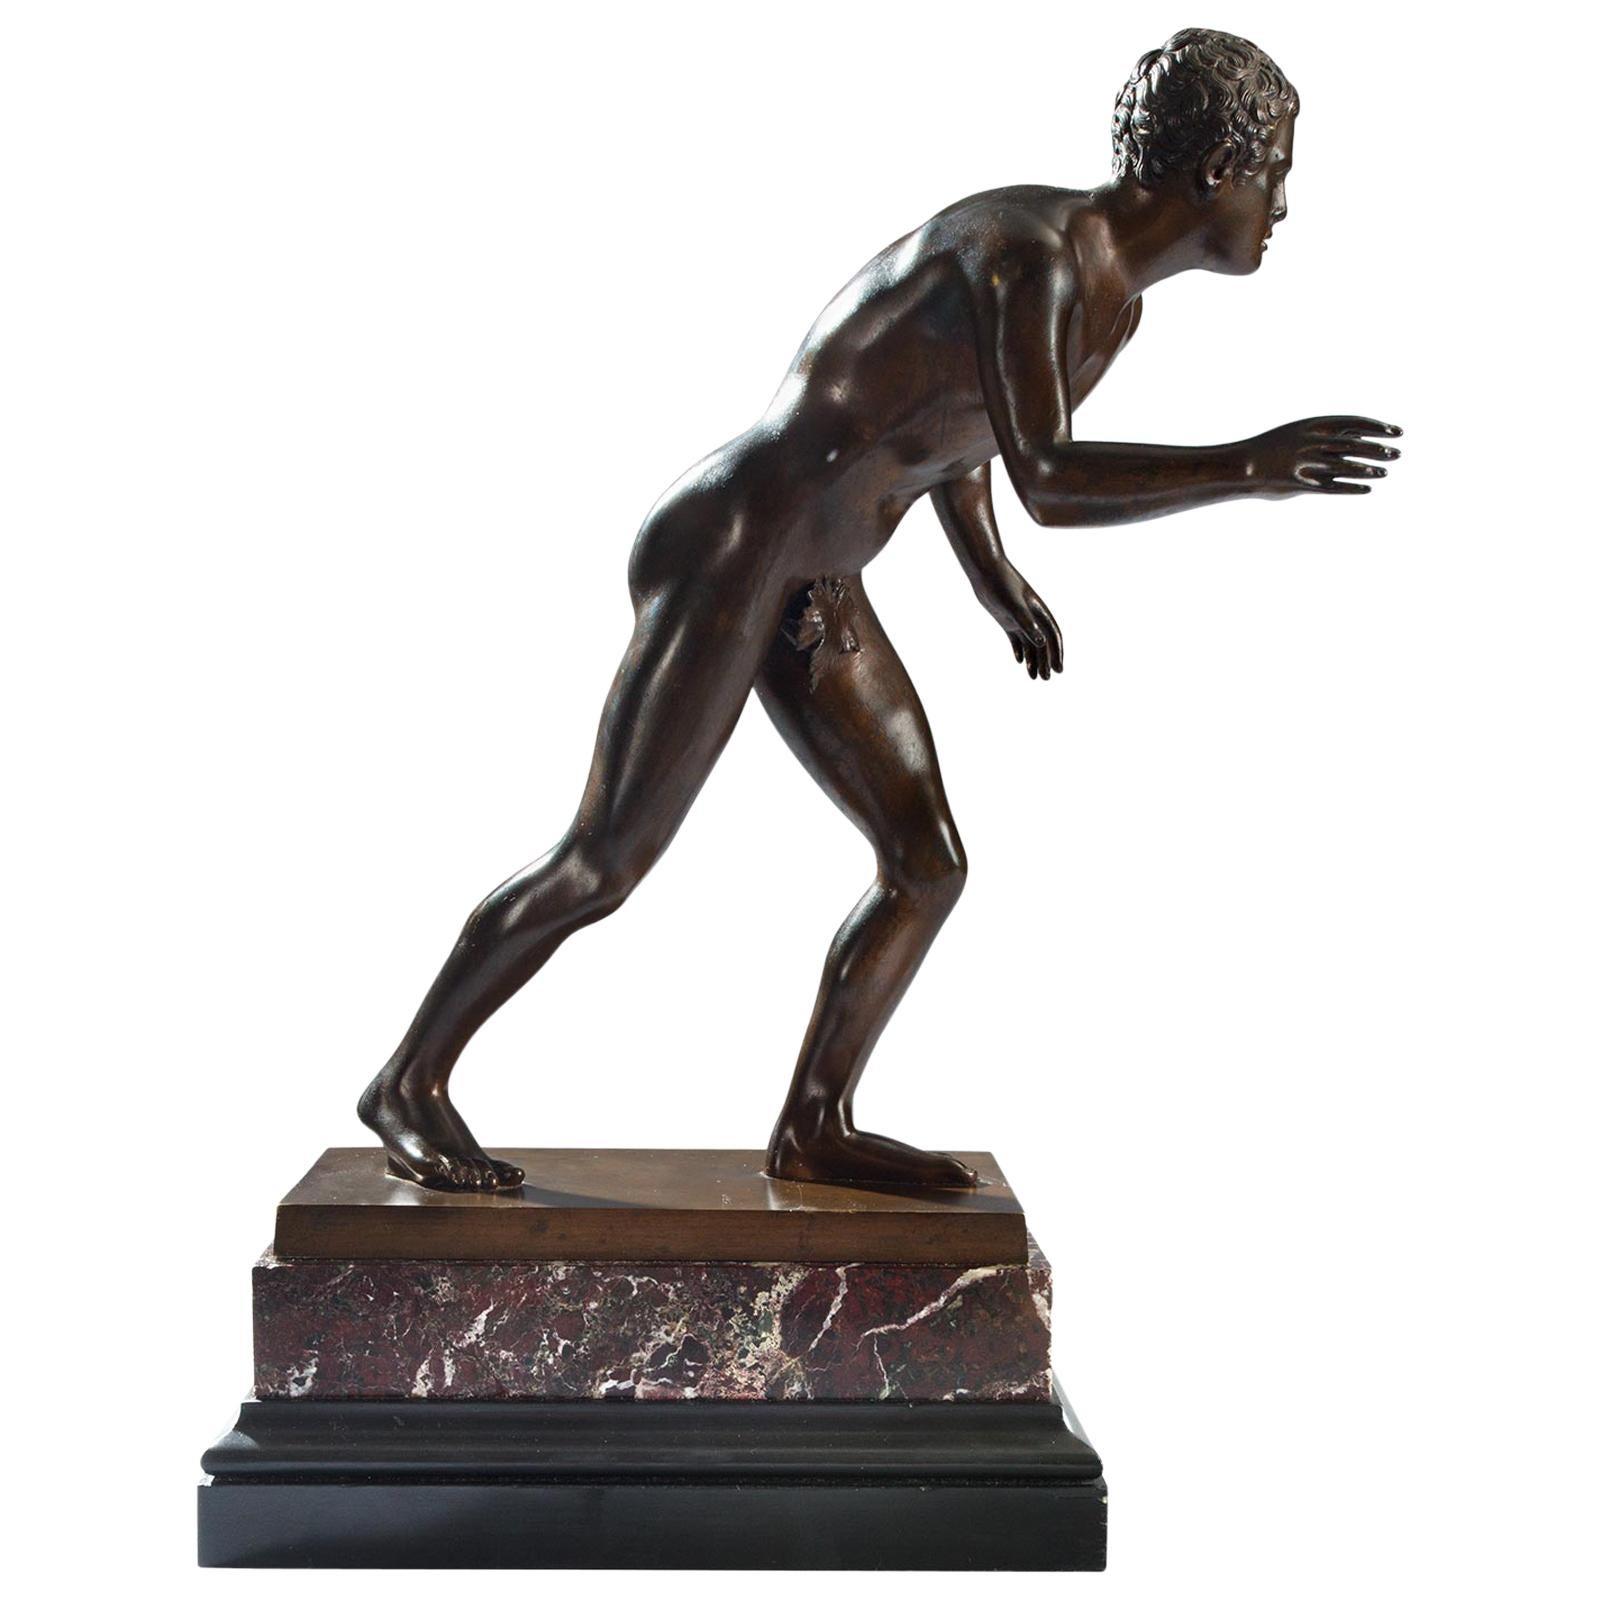 Italian 19th Century Grand Tour Period Patinated Bronze of a Roman Athlete